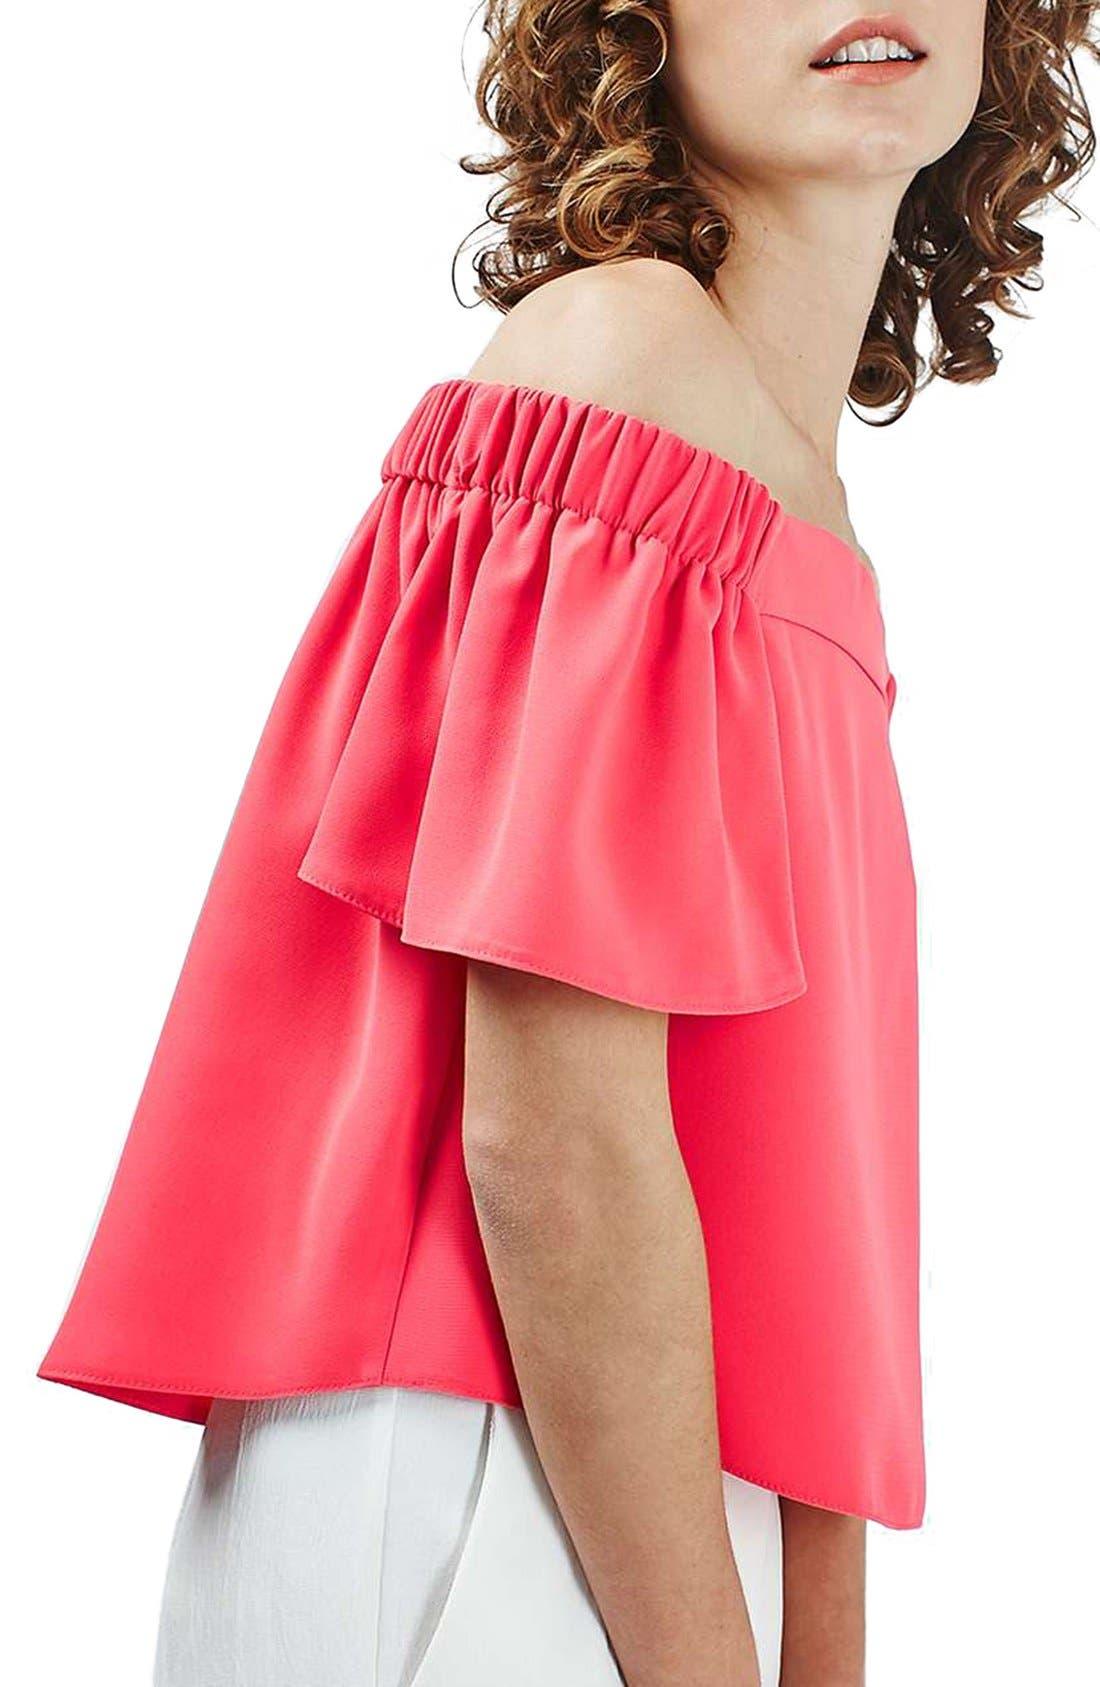 Main Image - Topshop 'Livi' Off the Shoulder Top (Regular & Petite)